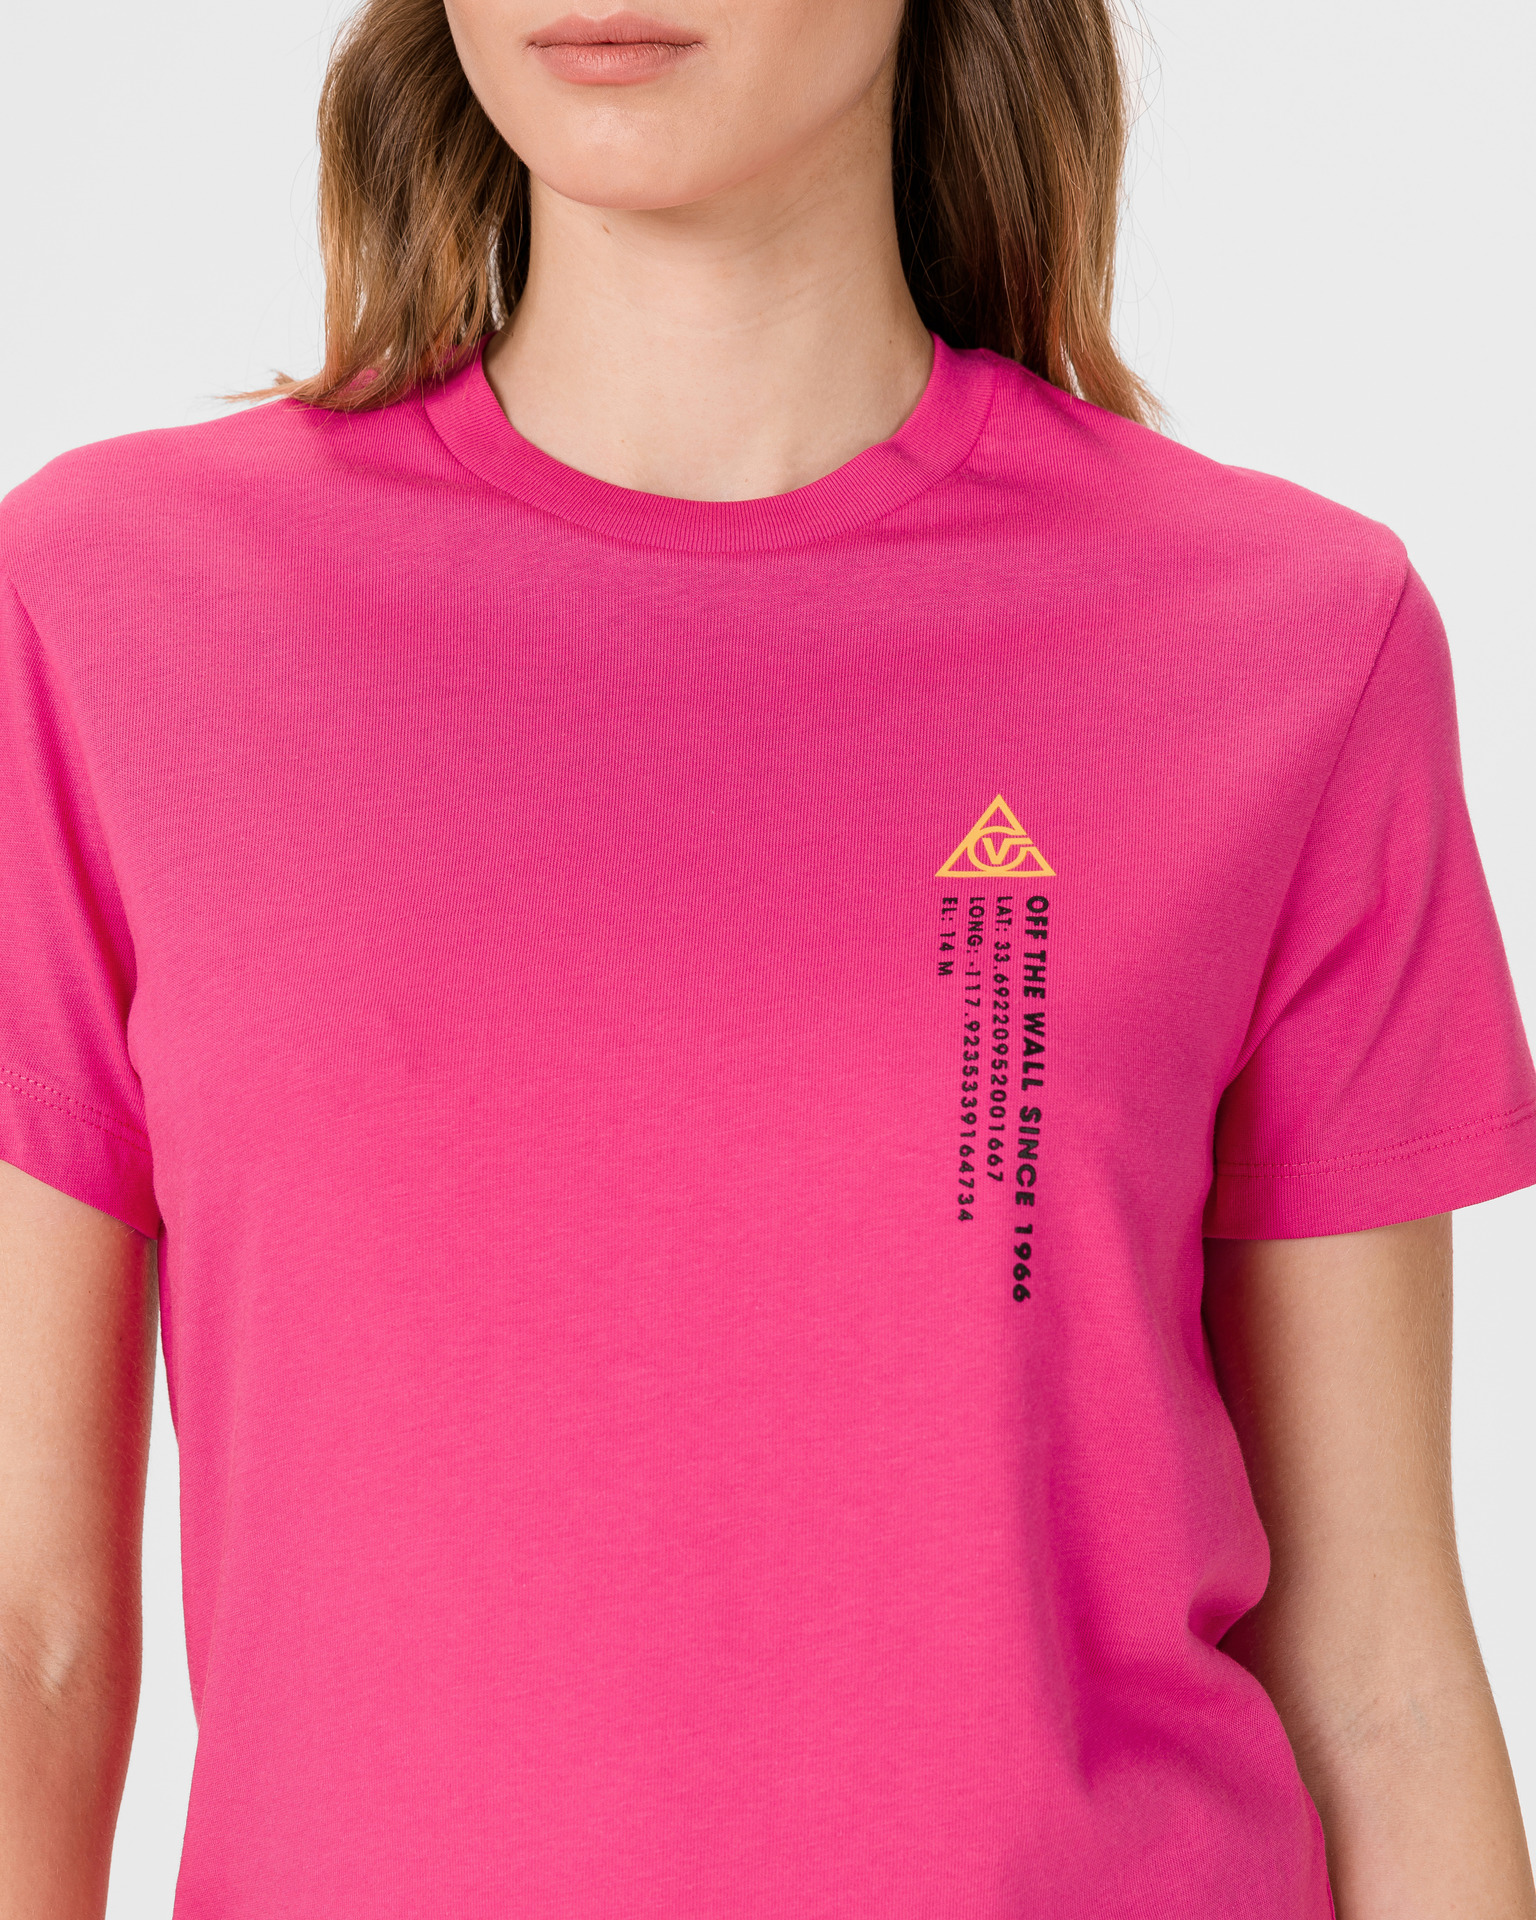 Vans pink T-shirt 66 Supply